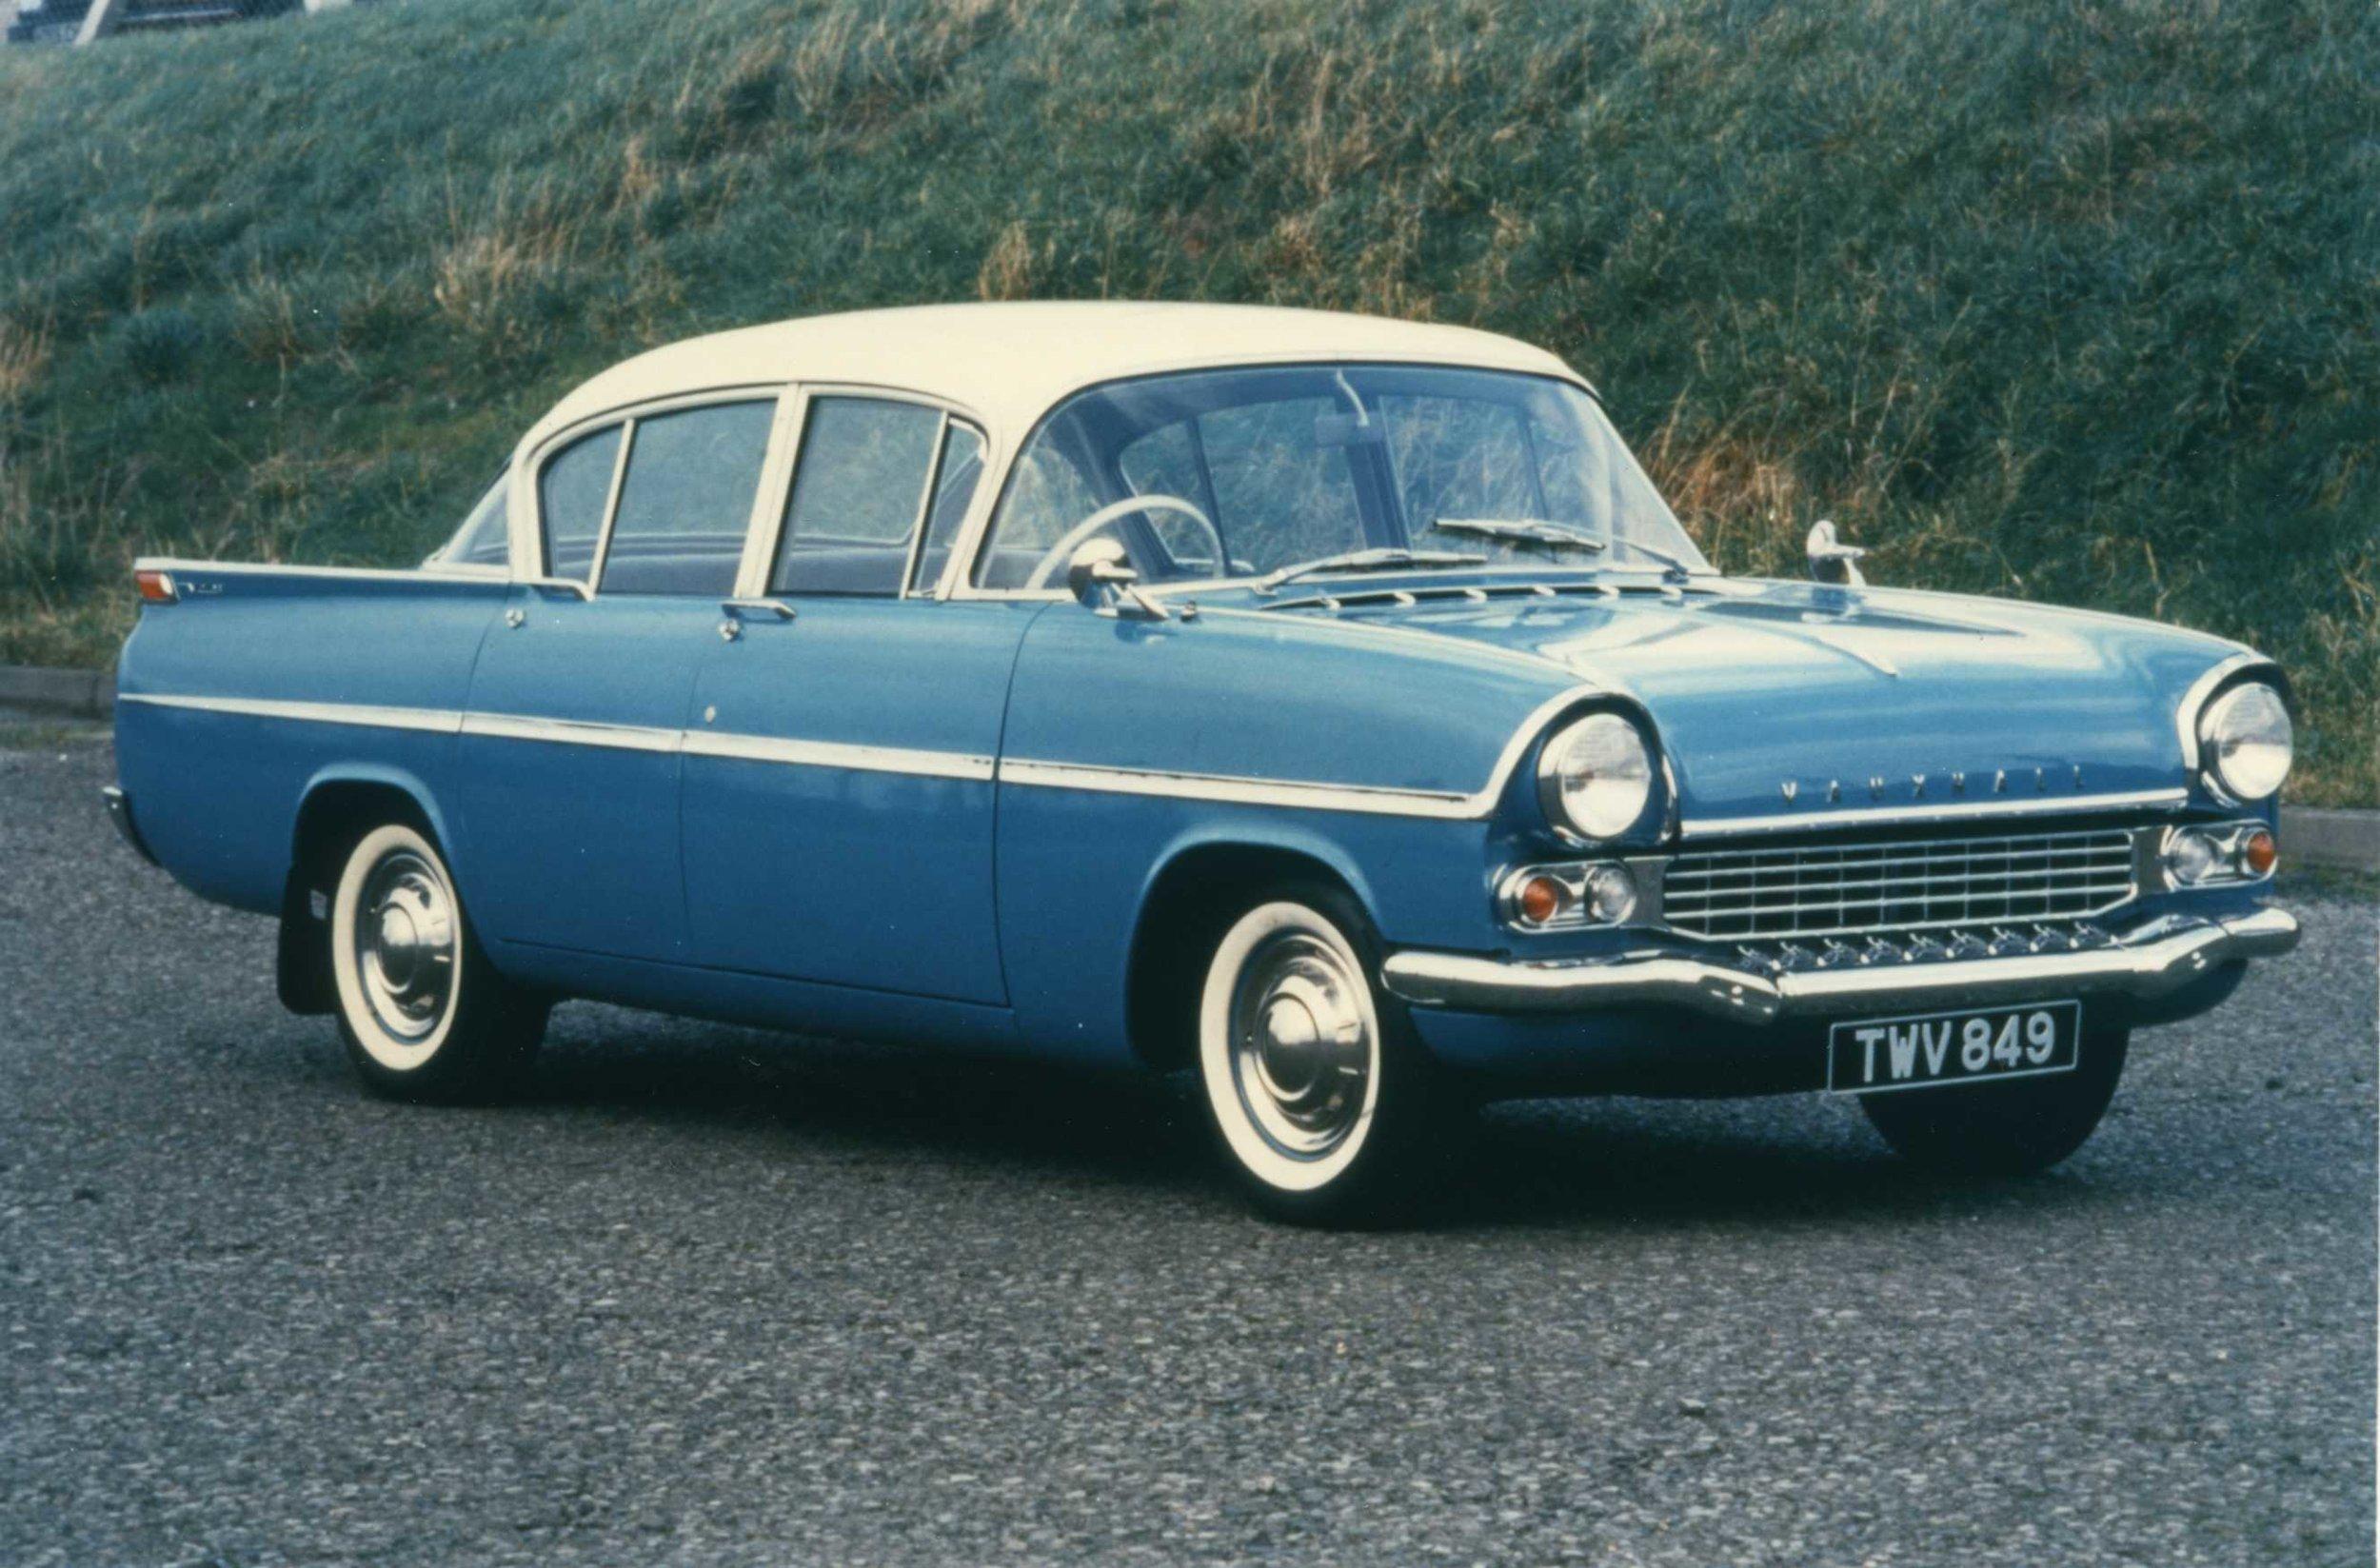 Transatlantic styling. Vauxhall Velox/Cresta of 1957